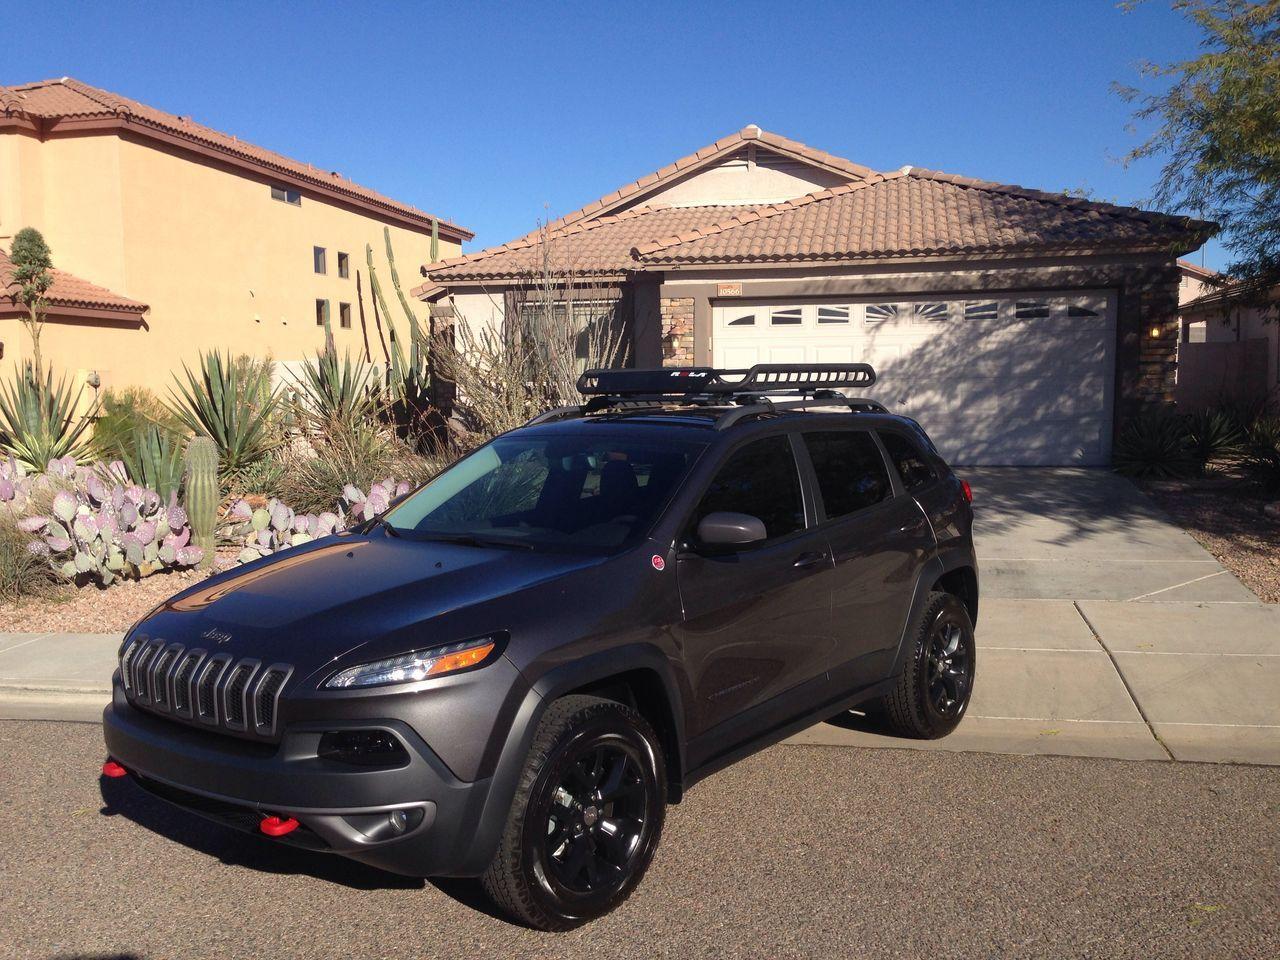 Superior Roof Racks, Baskets U0026 Spot Lights   Page 6   2014   2015 Jeep Cherokee